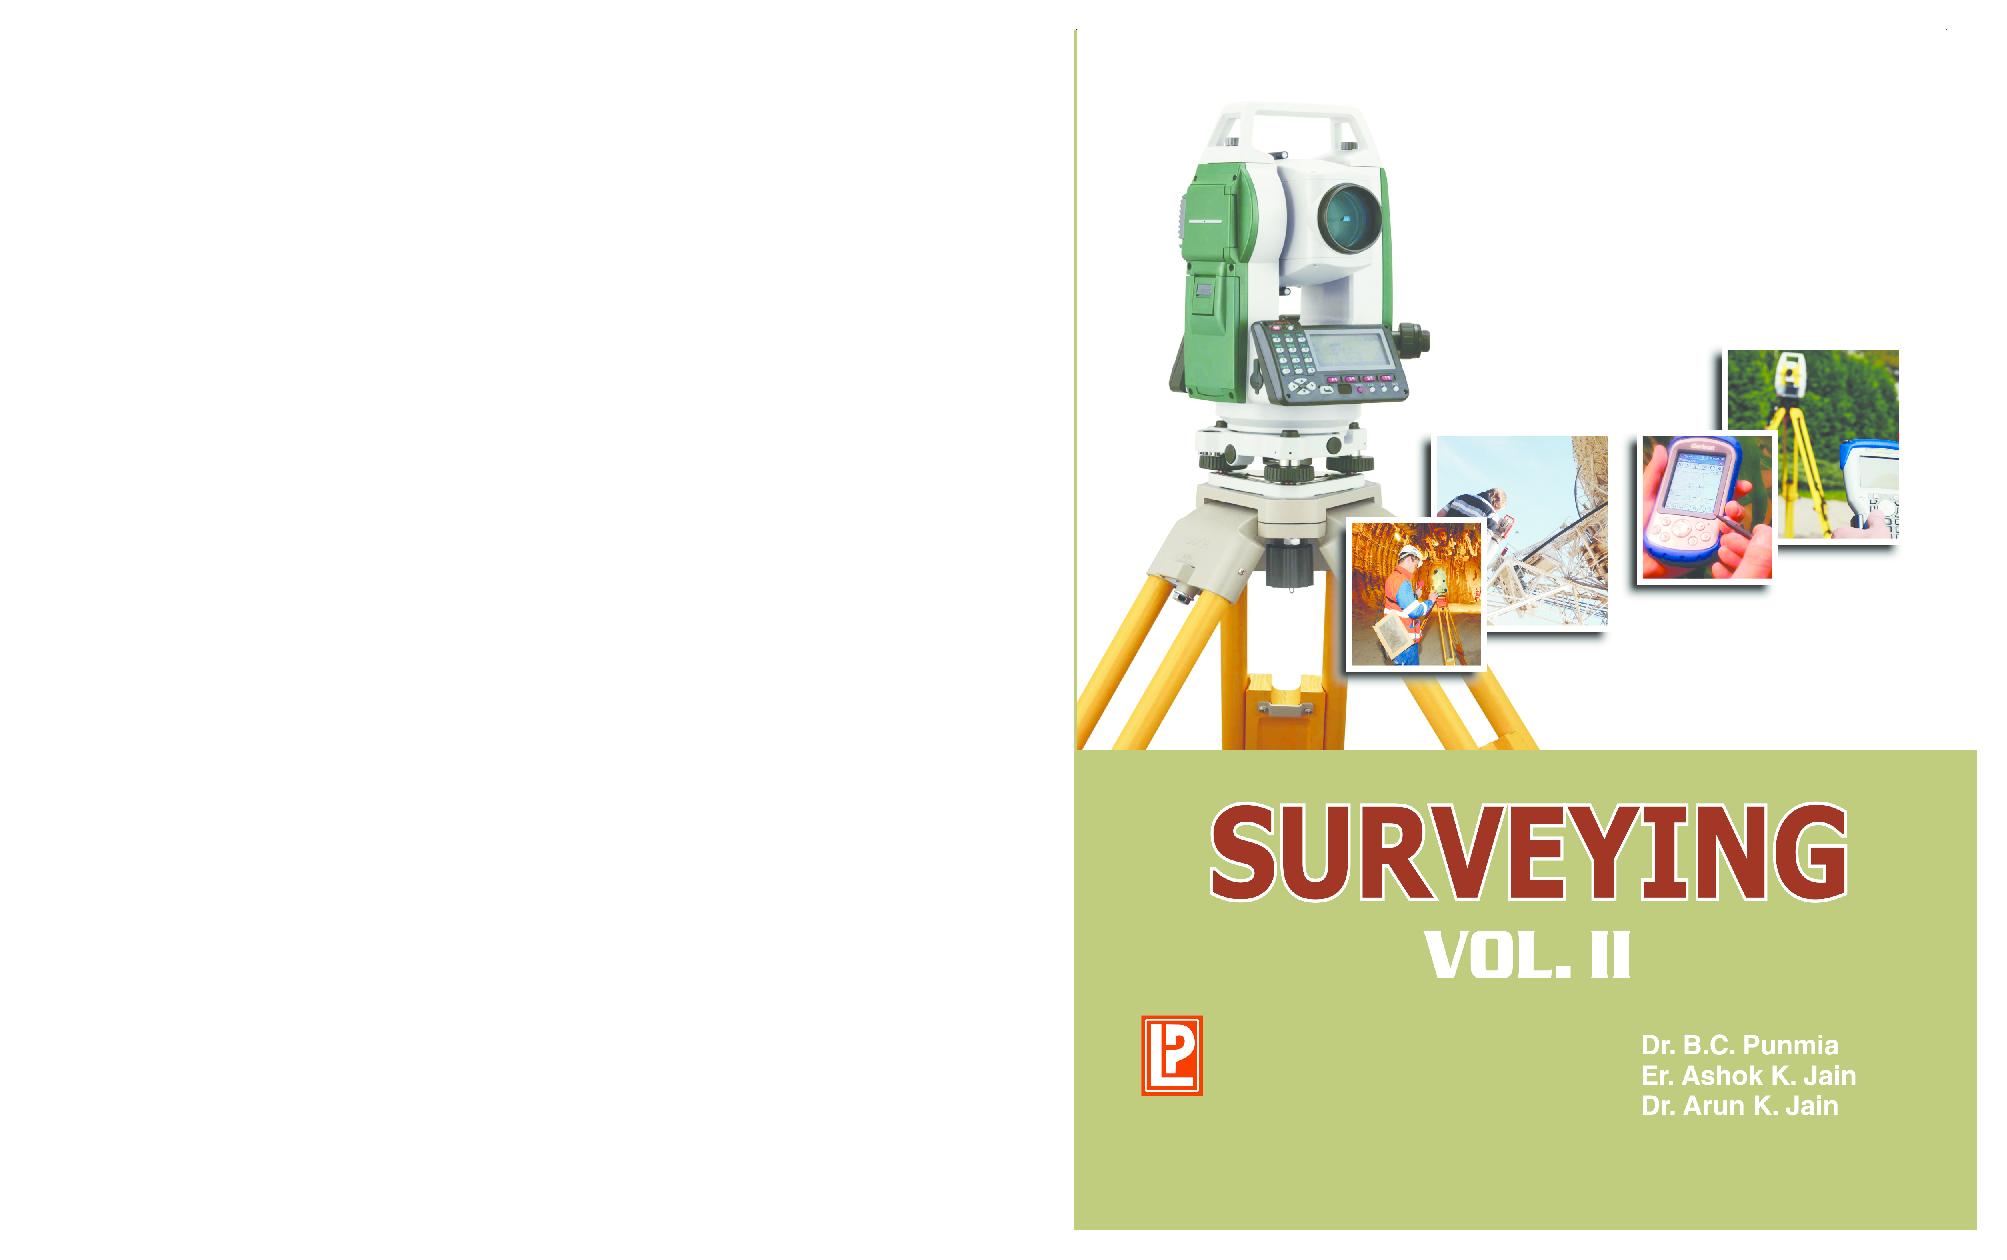 Surveying Vol.II  - Page 1